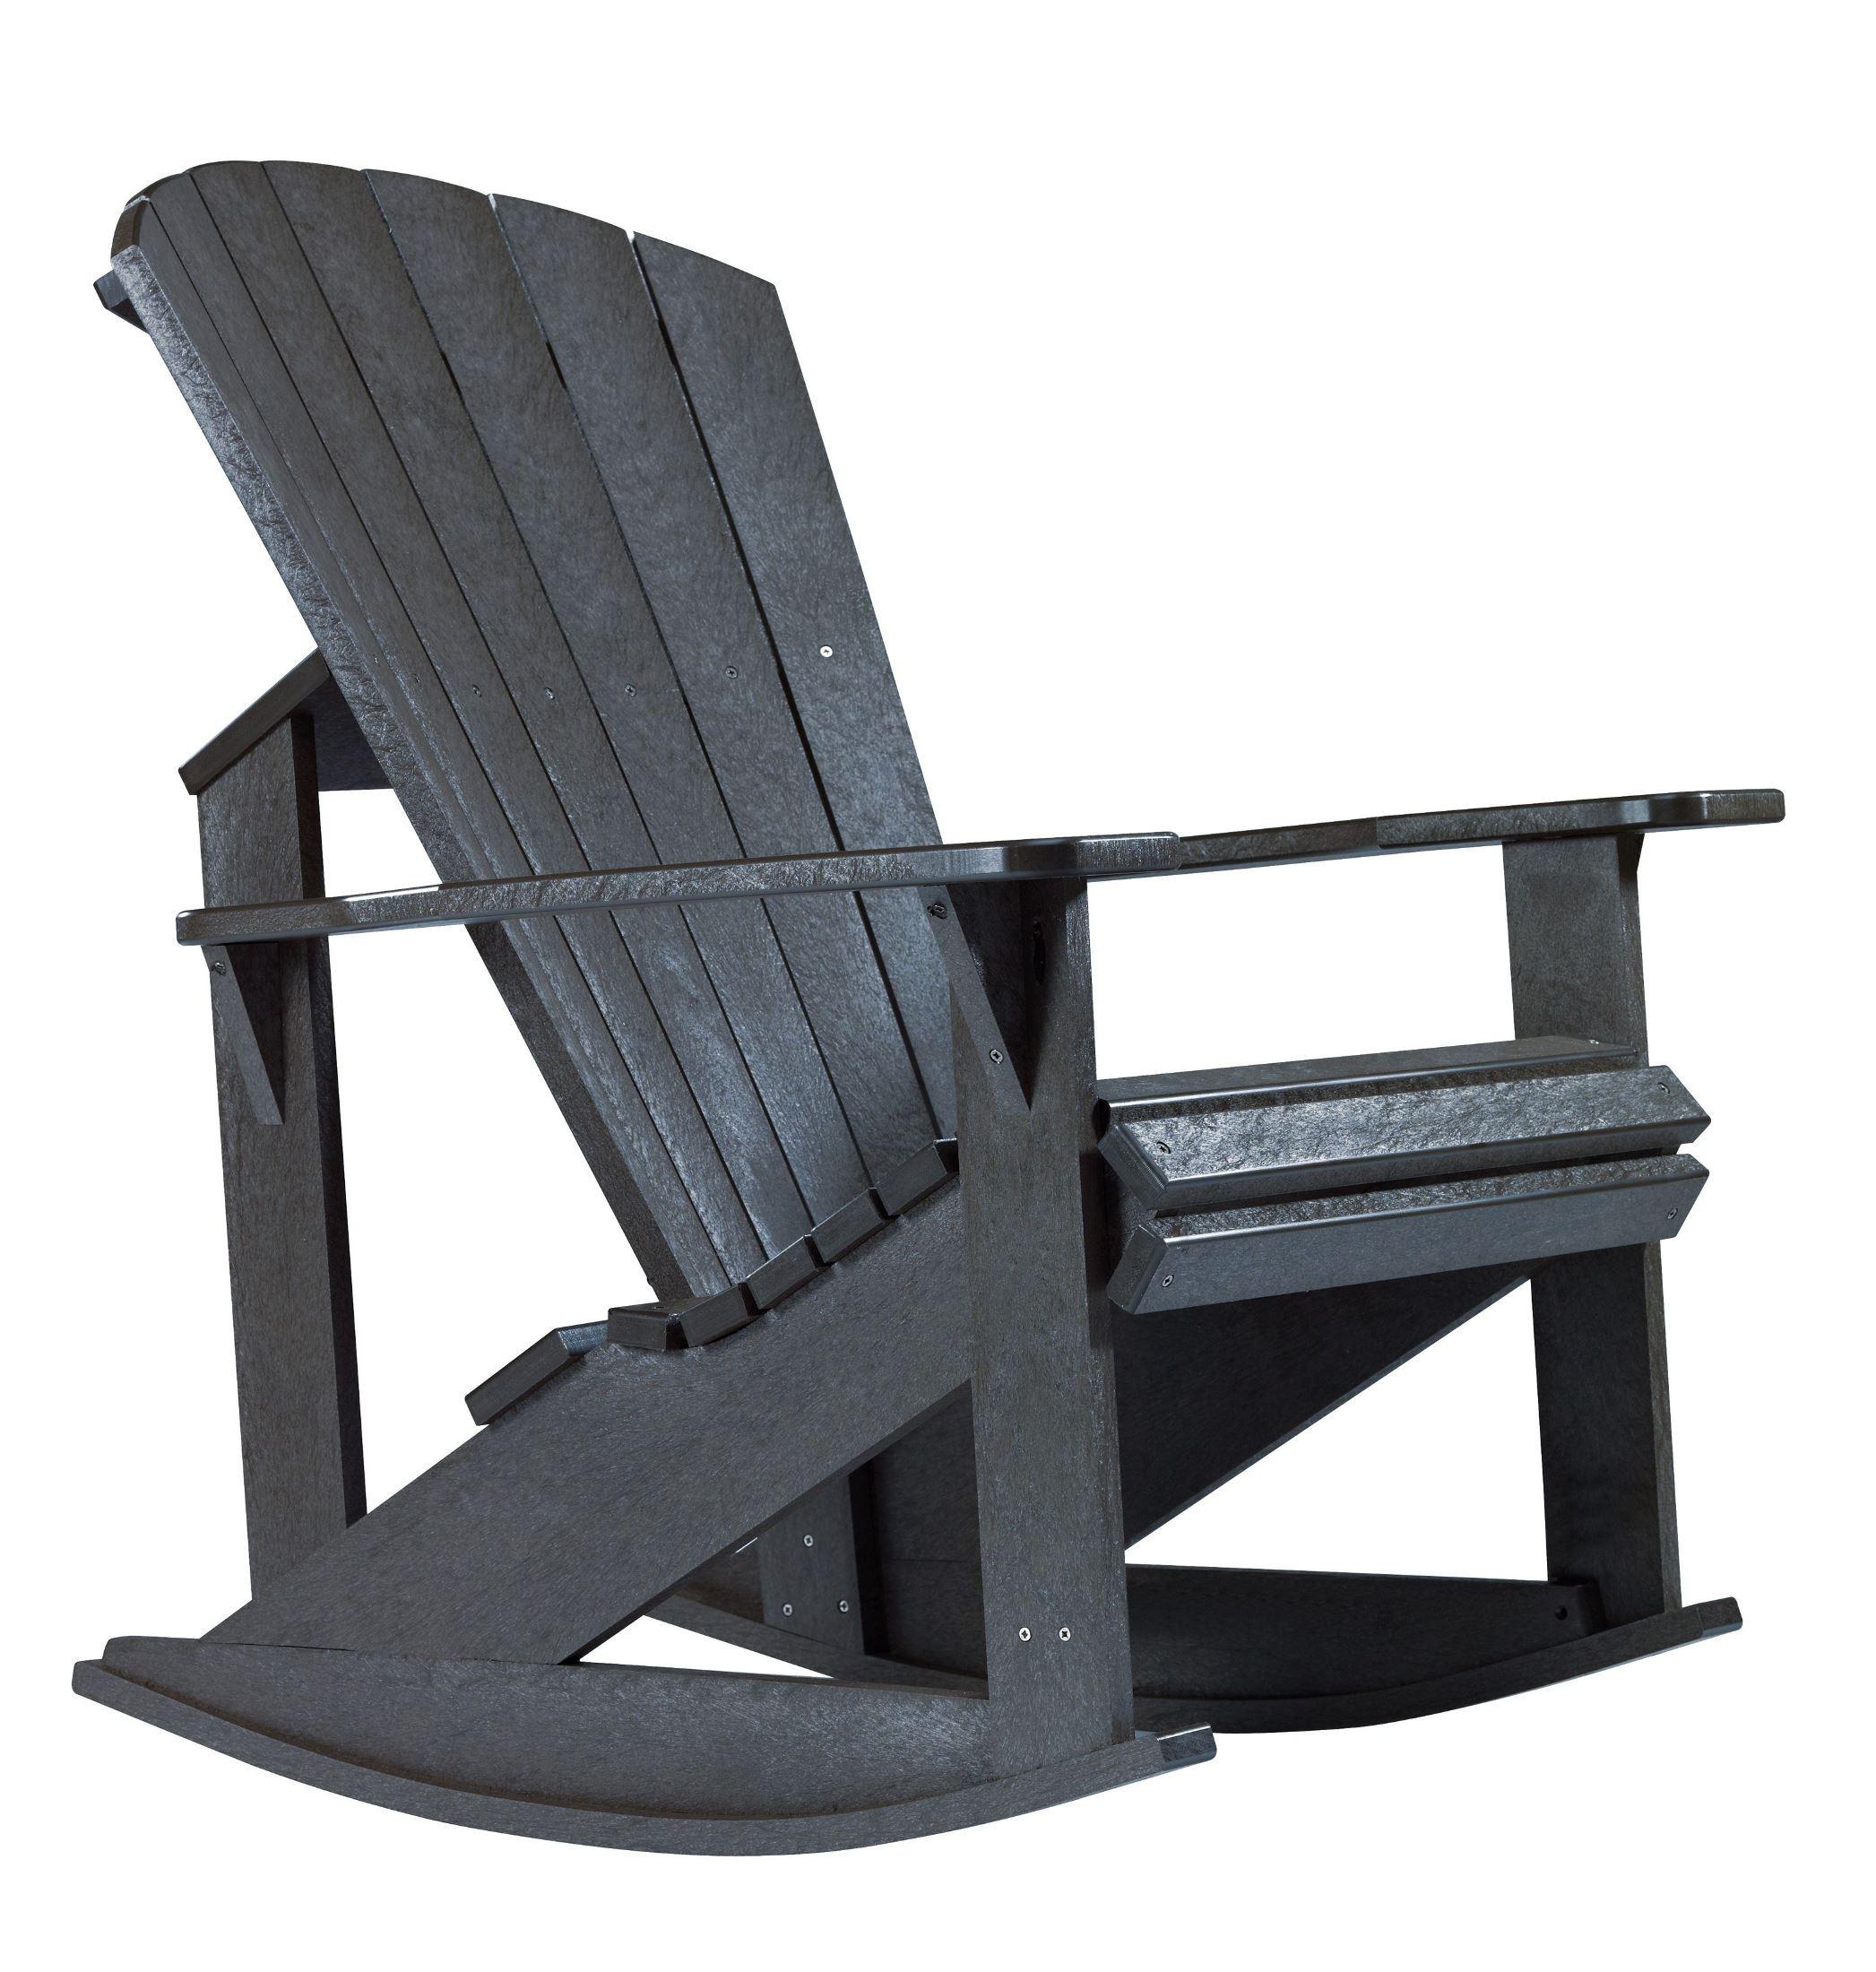 Coleman Rocking Chair Design Home & Interior Design